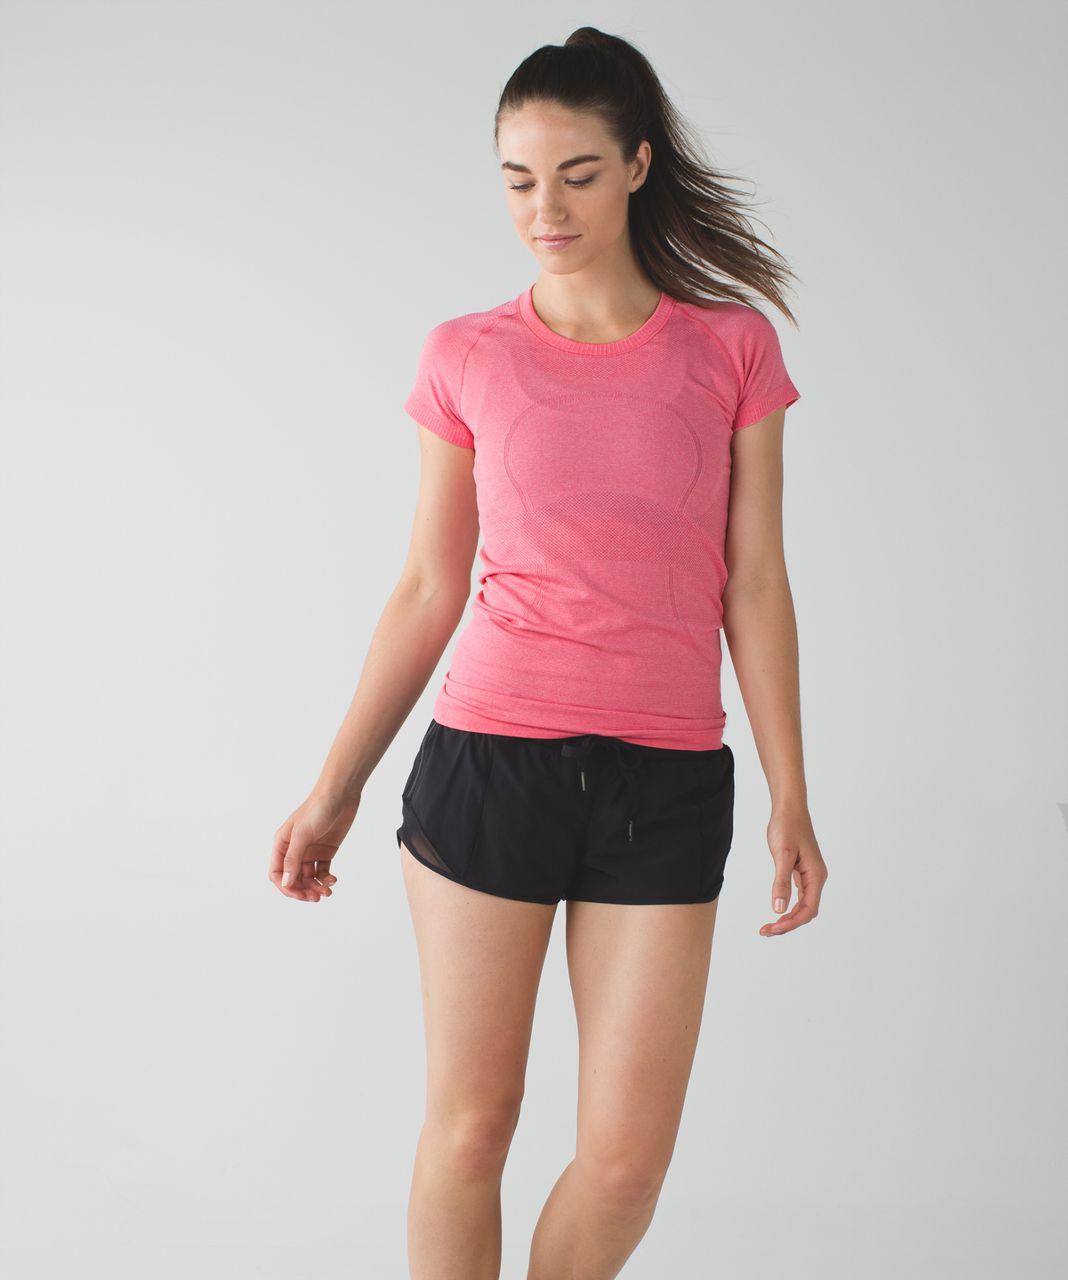 Lululemon Swiftly Tech Short Sleeve Crew - Heathered Pink Lemonade